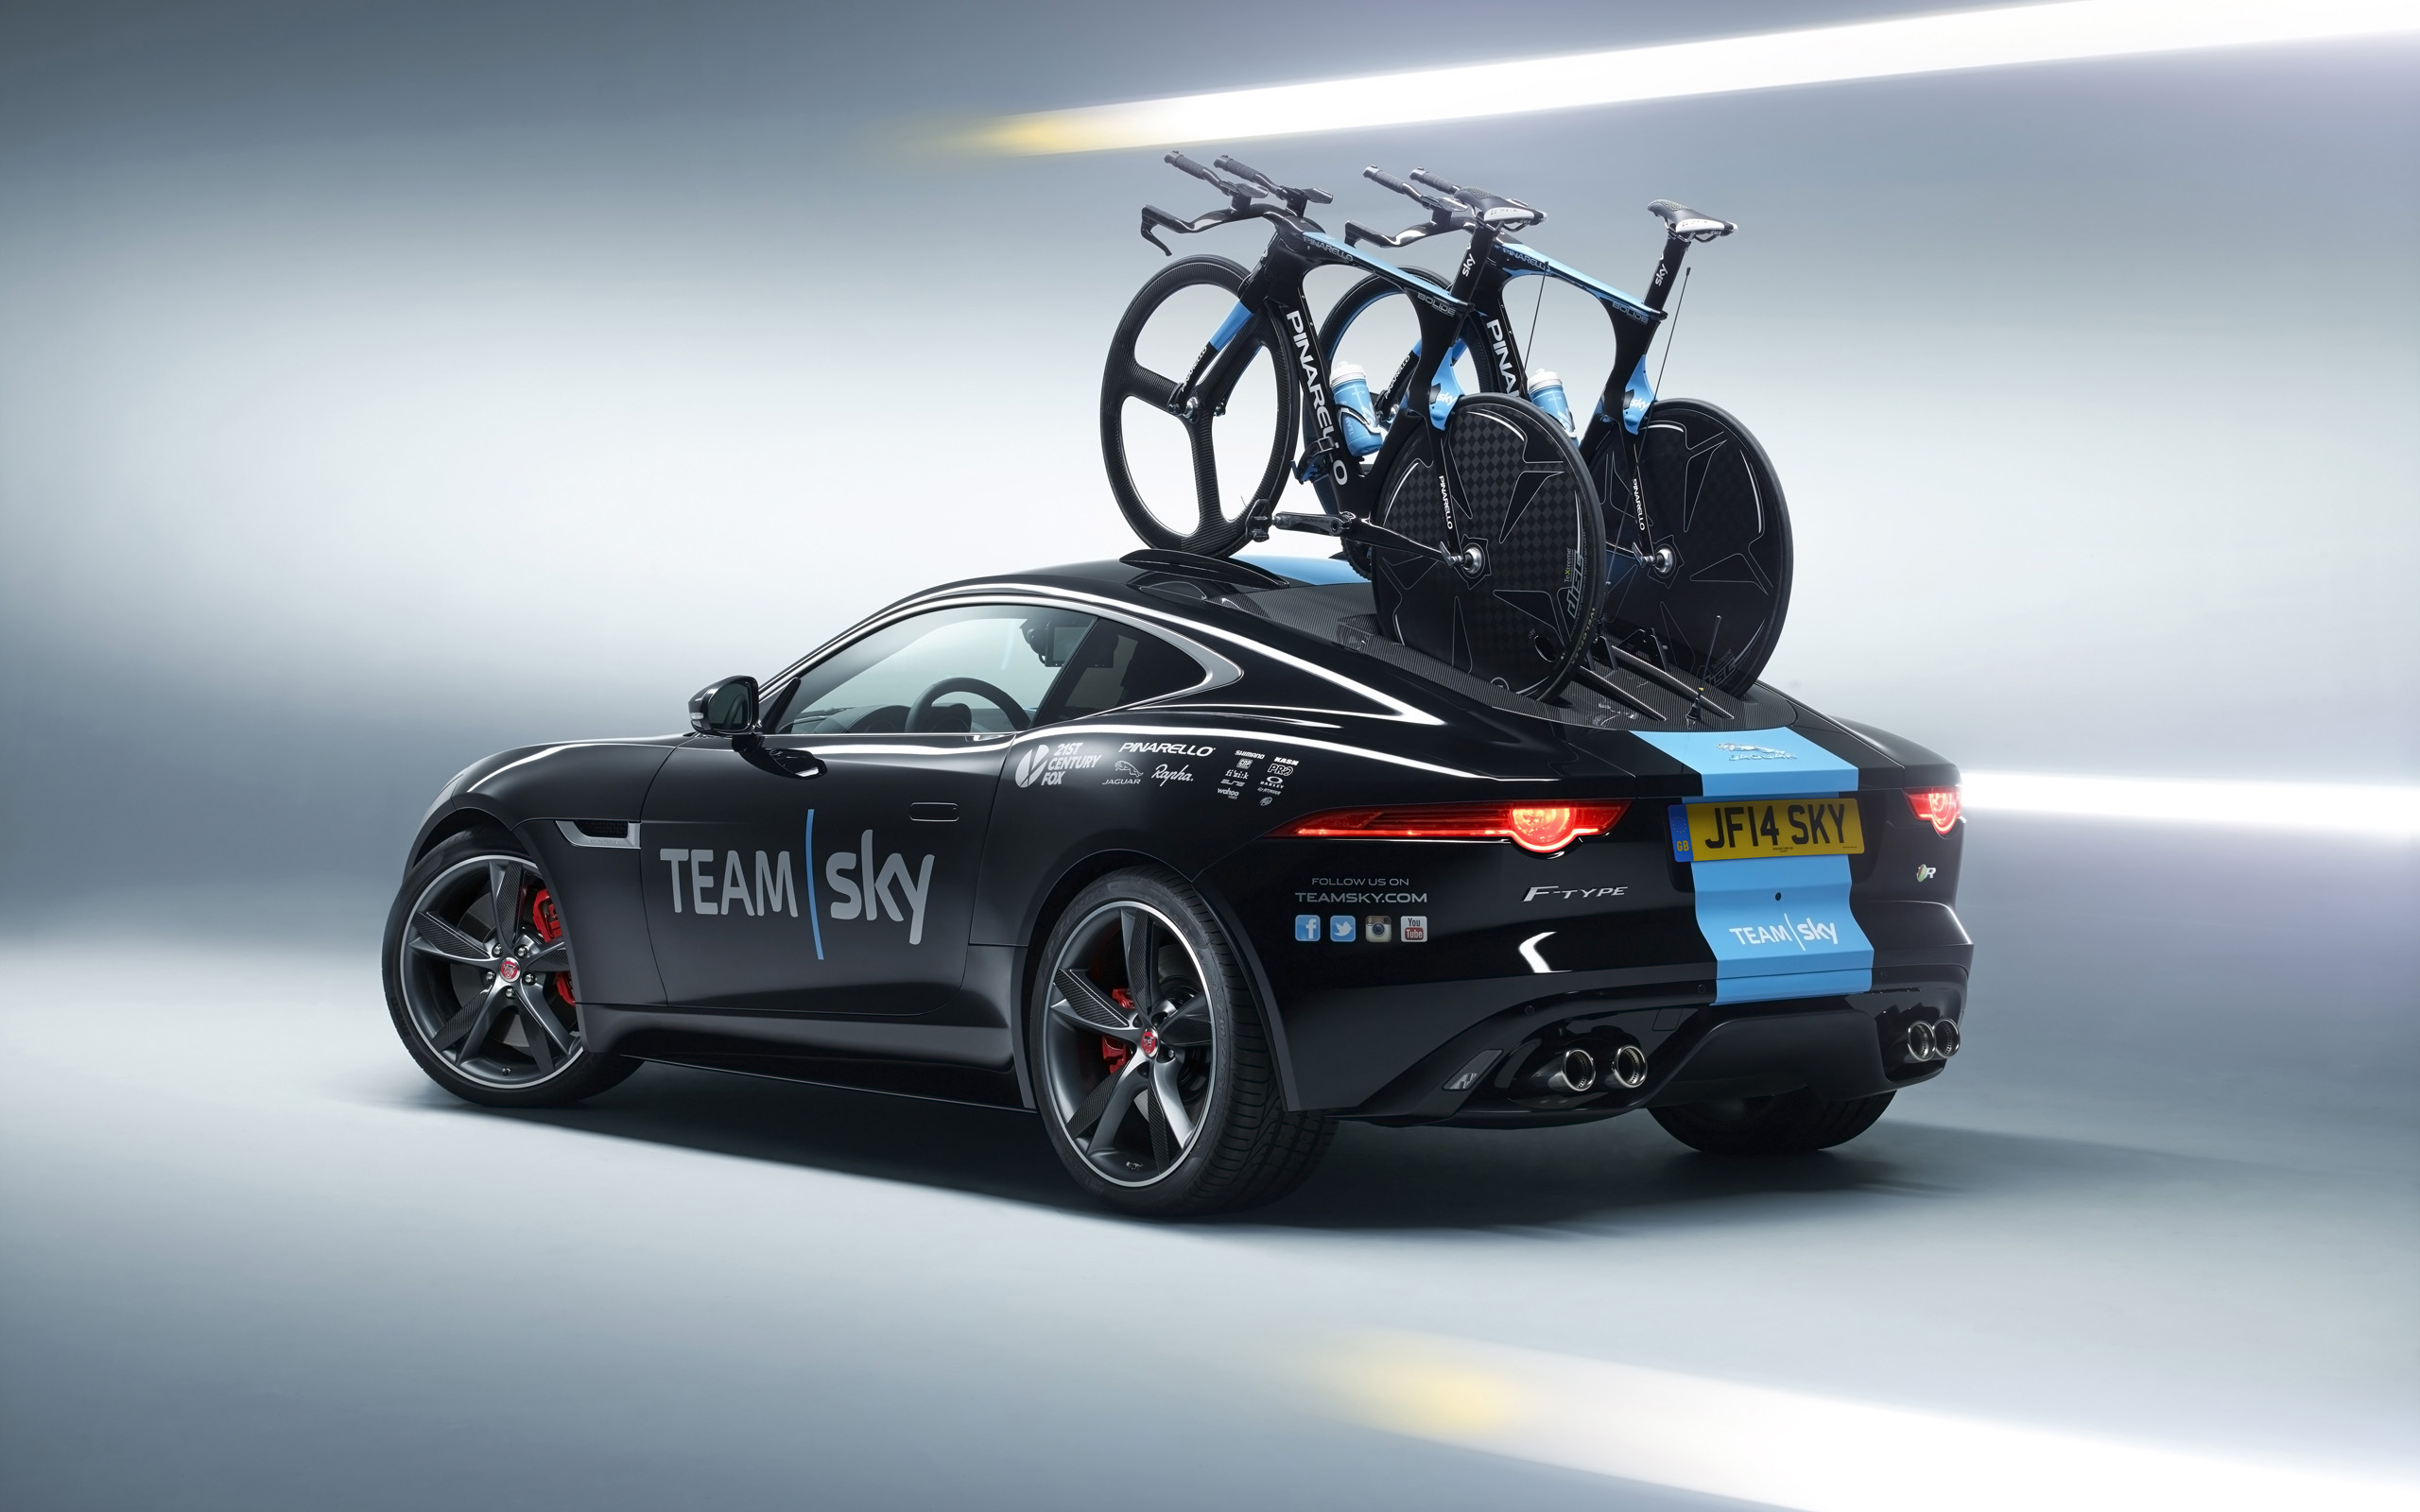 2014 jaguar f type coupe tour de france 3 wallpaper hd car wallpapers id 4667. Black Bedroom Furniture Sets. Home Design Ideas